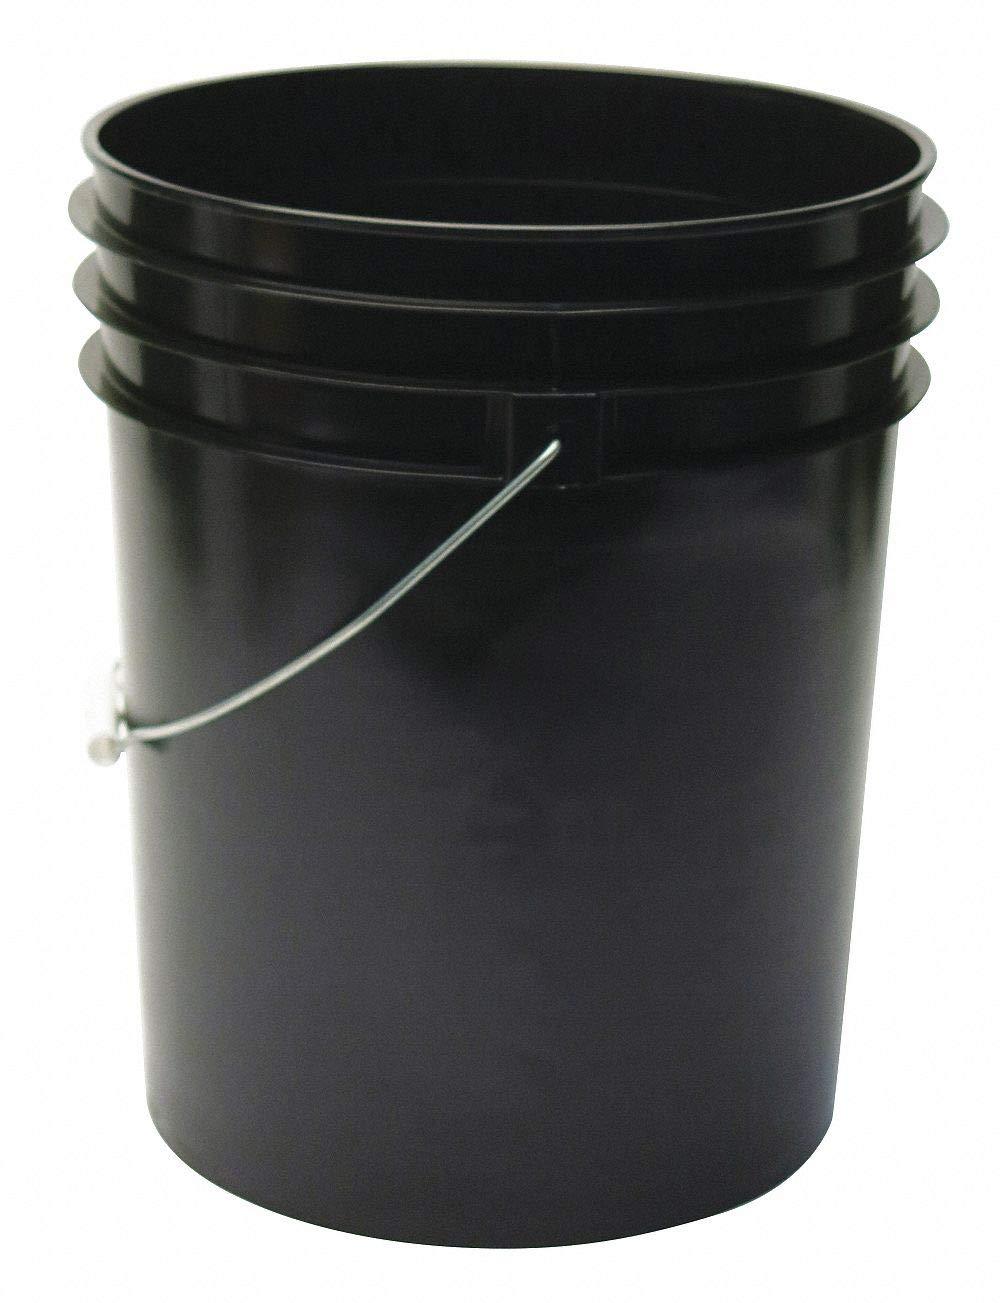 5.0 gal. High Density Polyethylene Round Pail, Black pack of 5